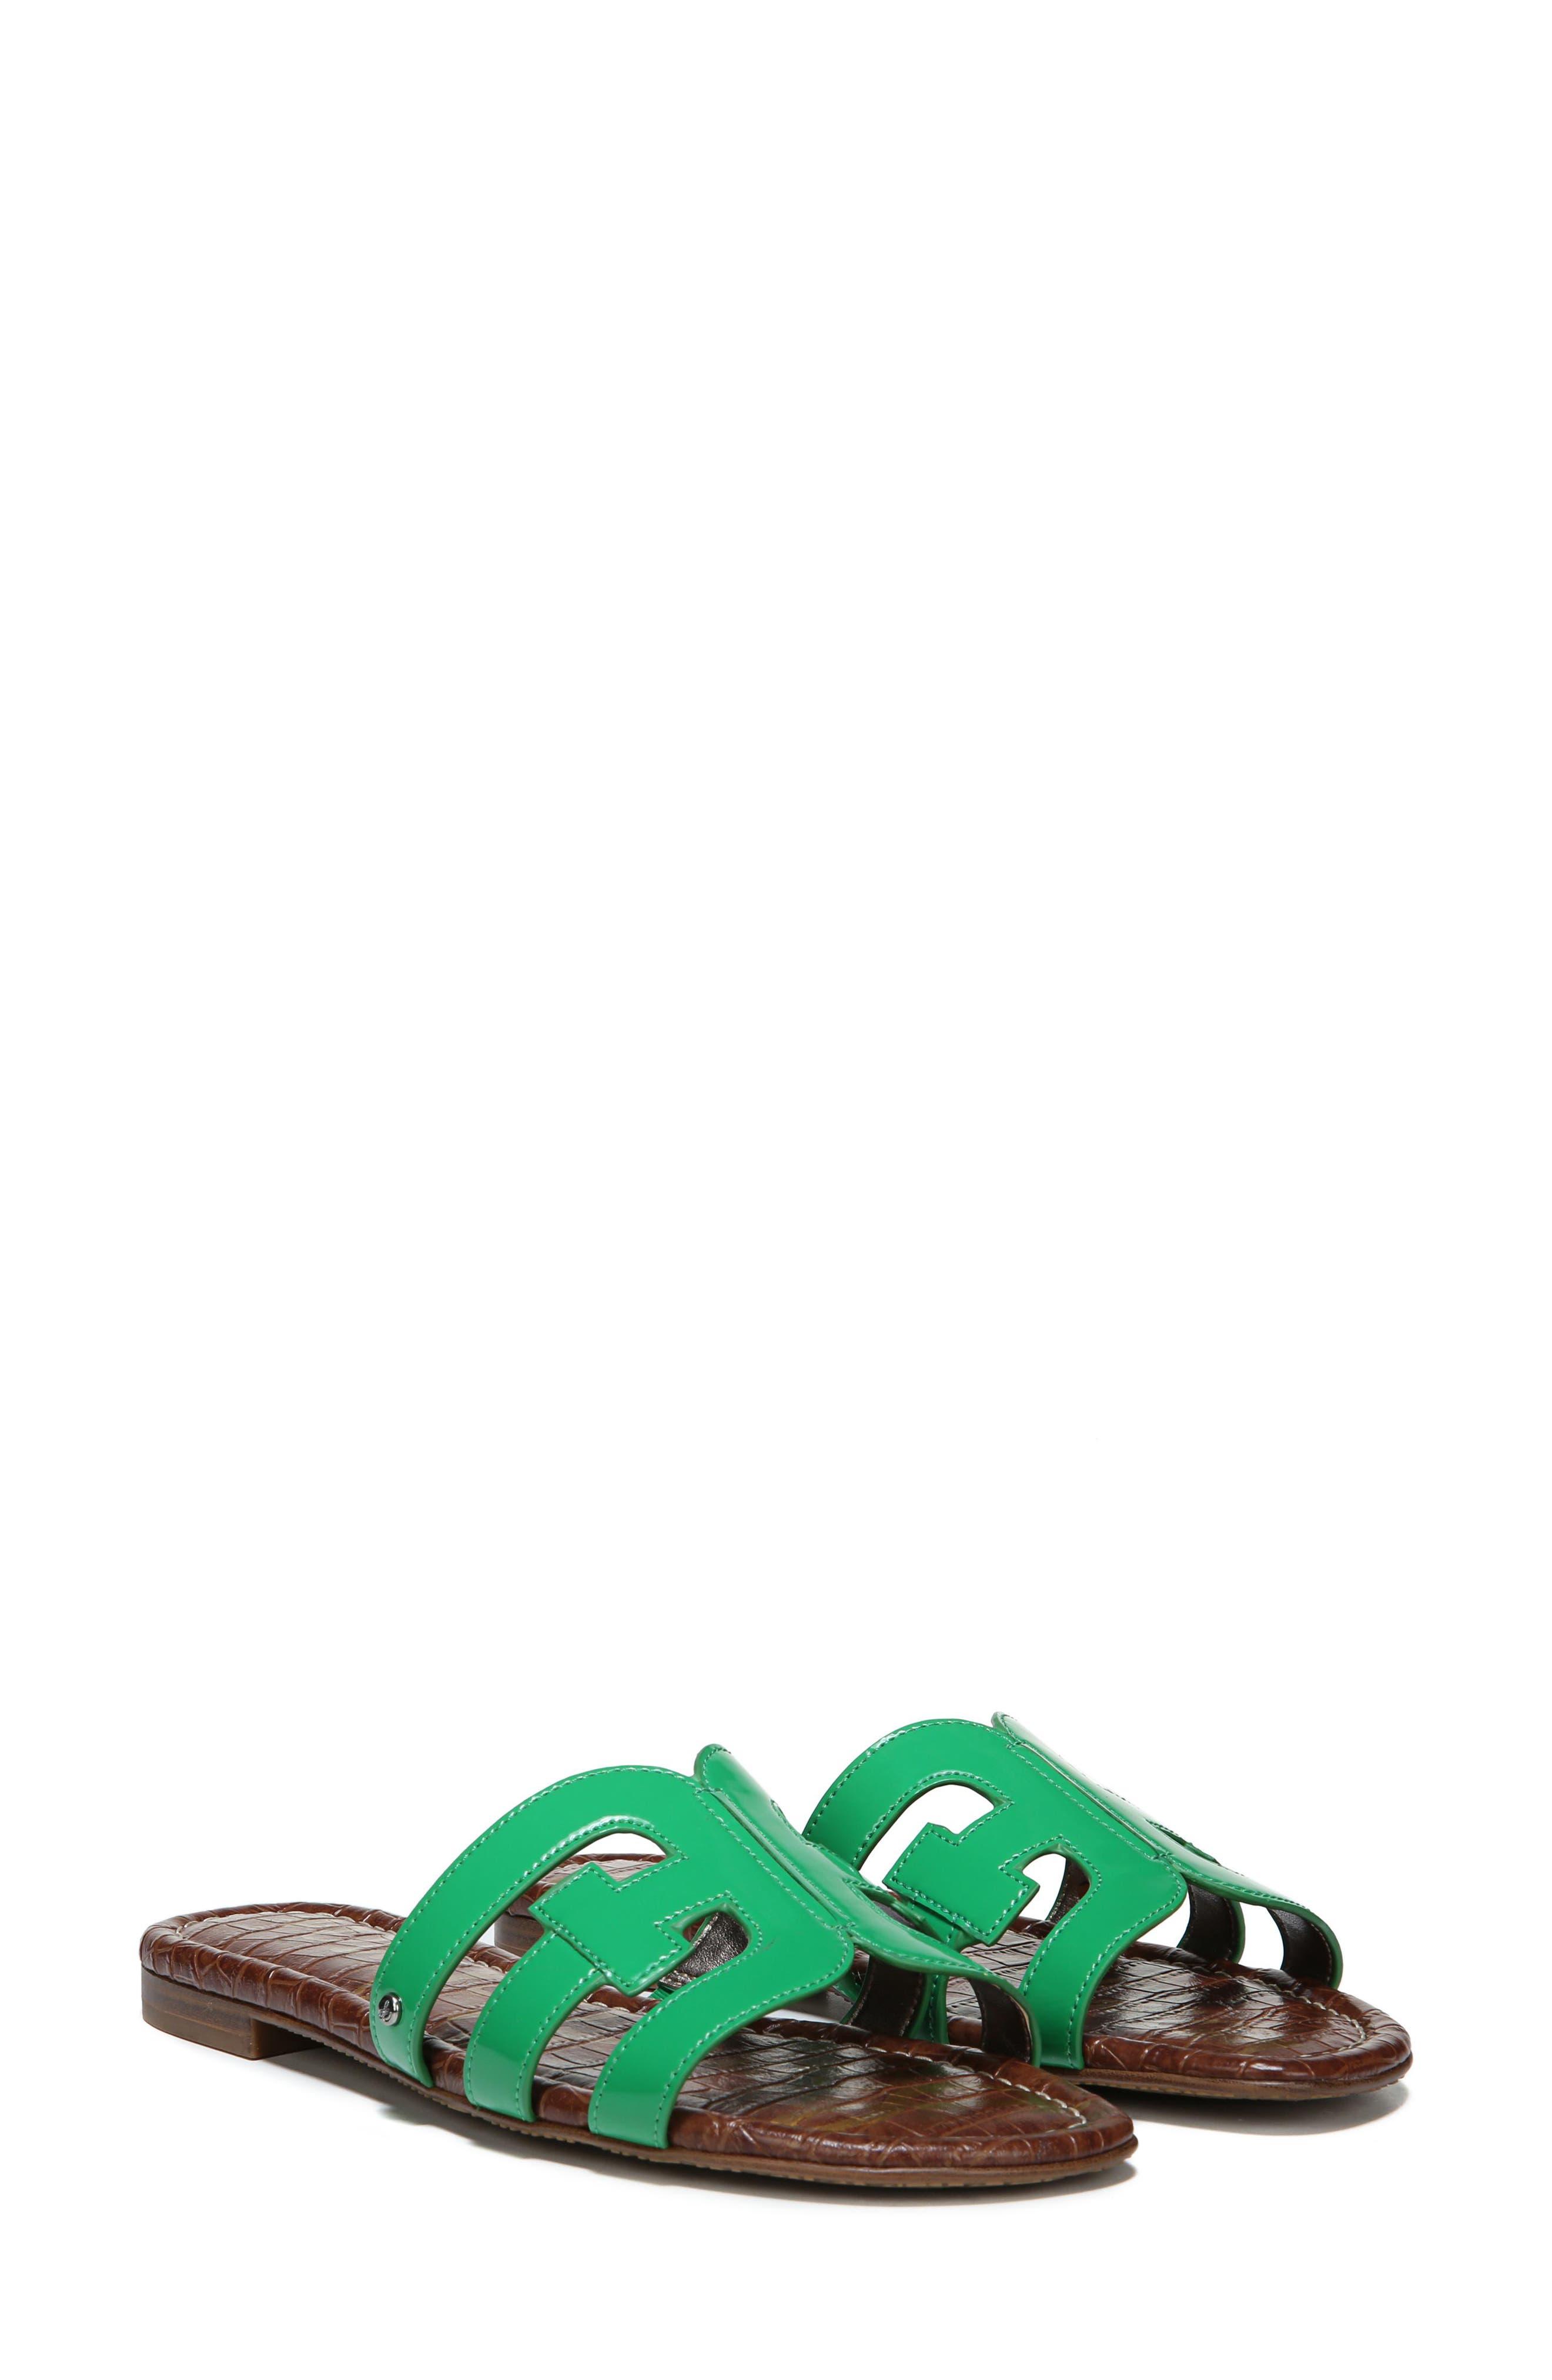 Bay Cutout Slide Sandal,                         Main,                         color, LEAF GREEN PATENT LEATHER